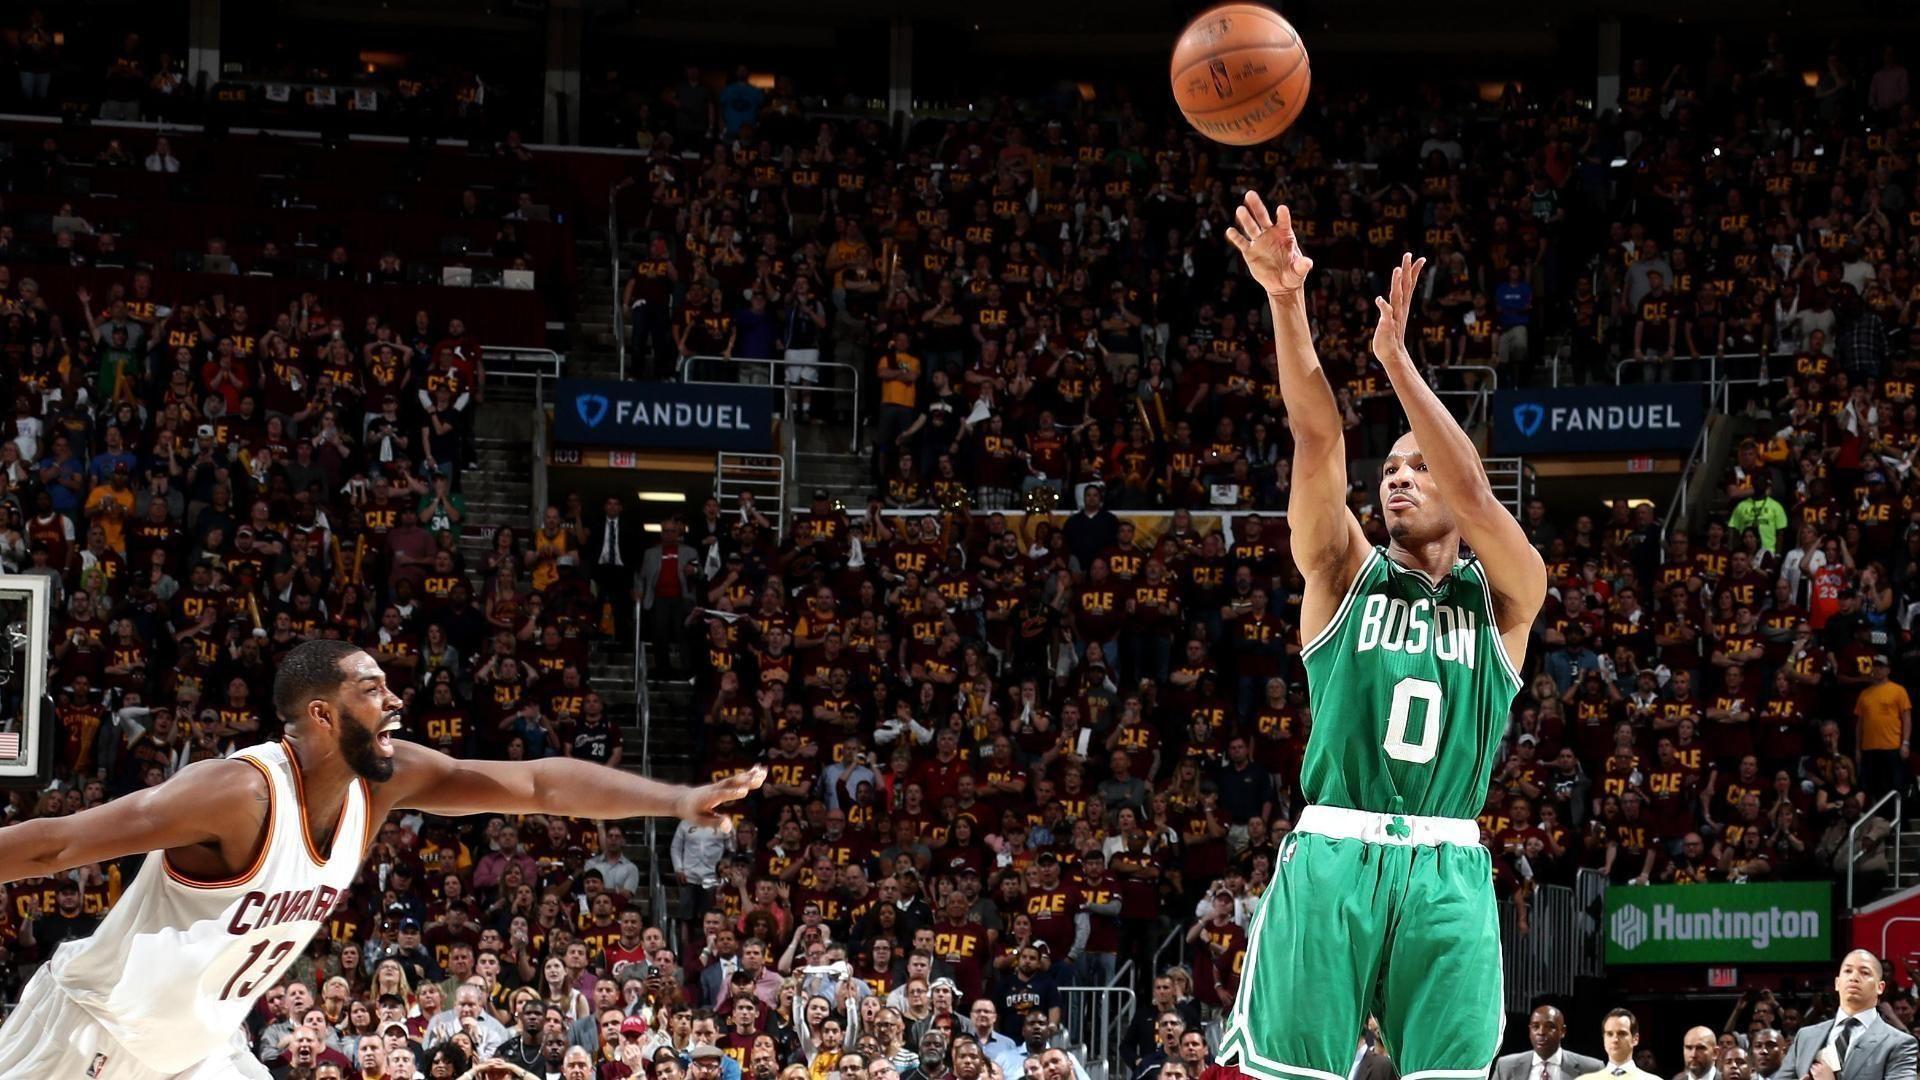 Your Morning Dump... Celtics Complete Amazing Comeback, Temporarily Restore the Faith